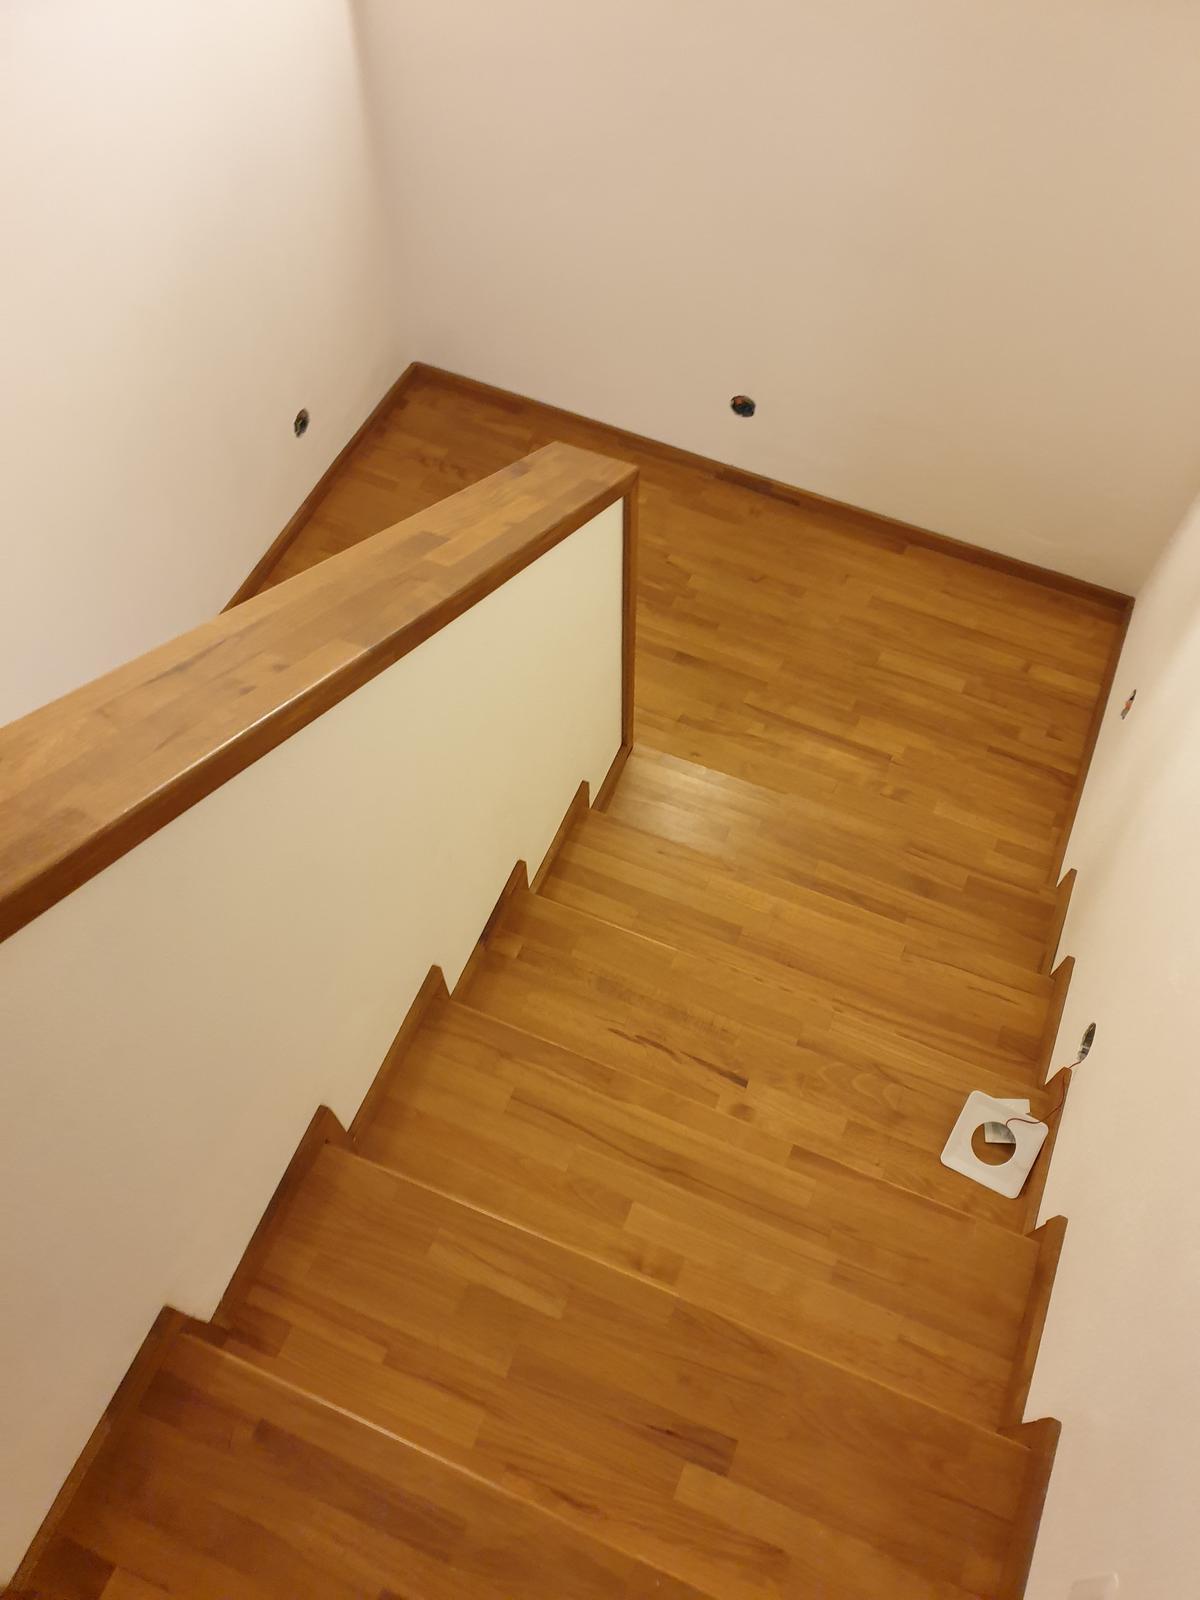 Konzolové schody - BUK, DUB - Obrázok č. 28